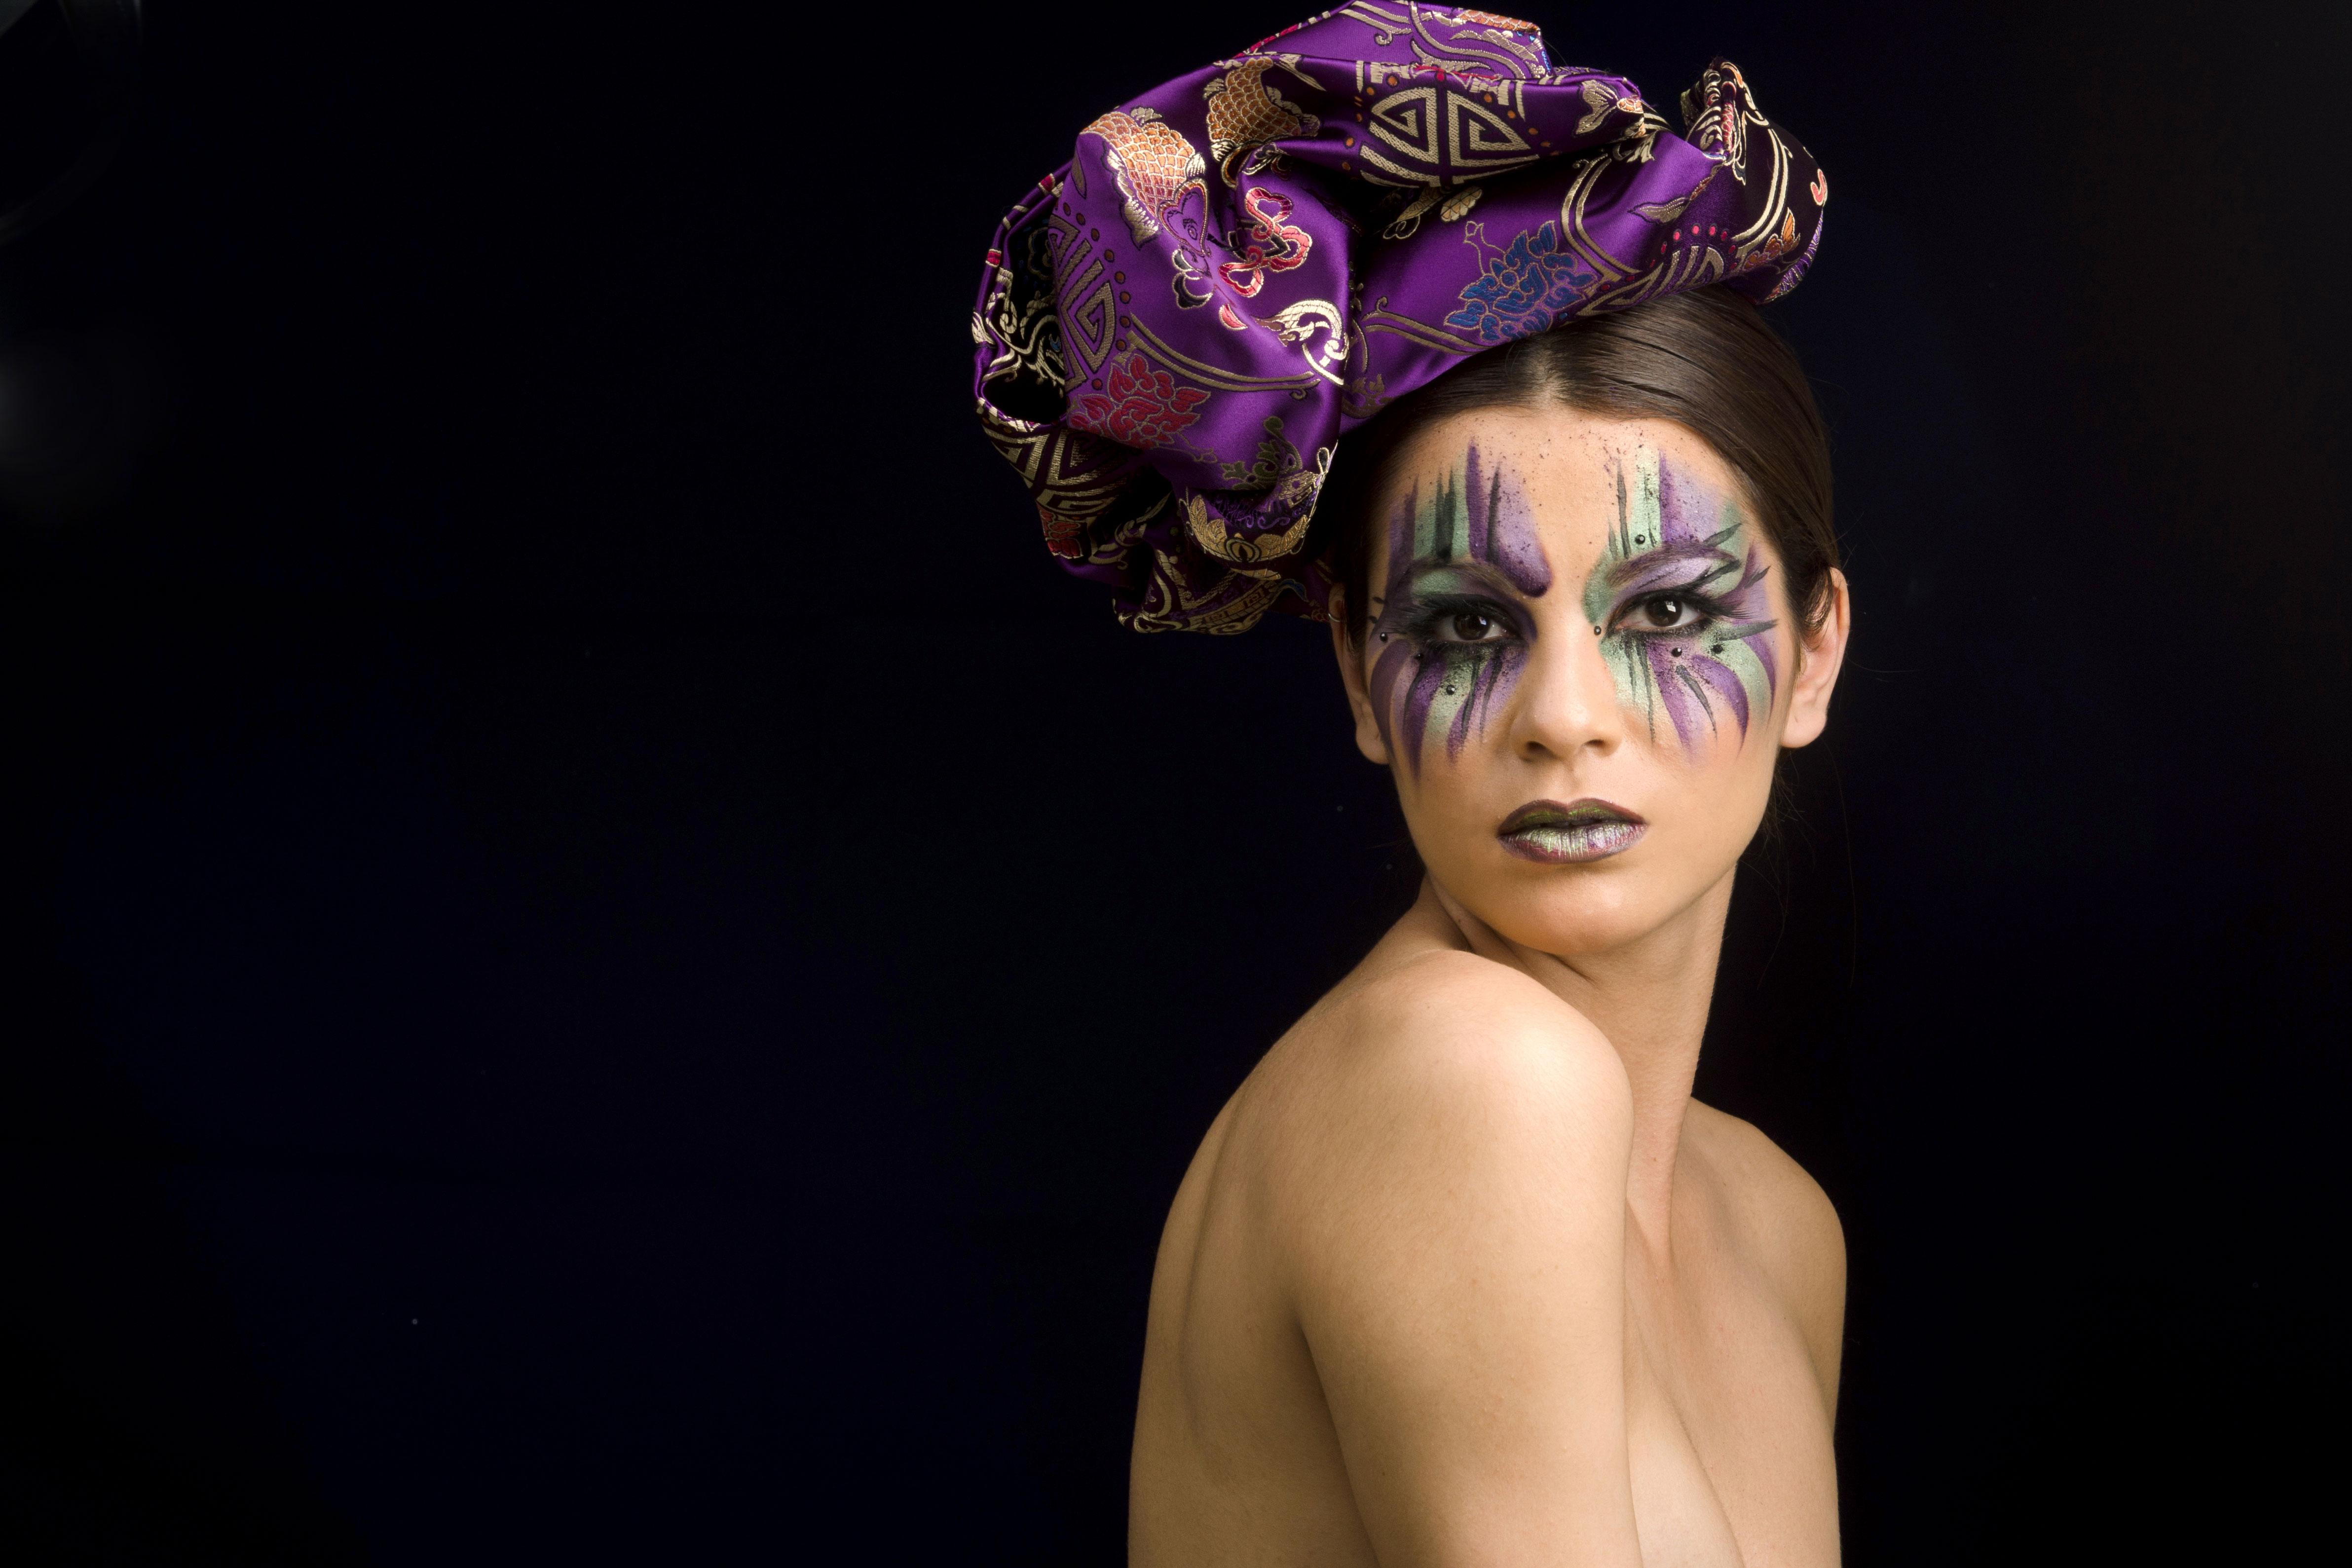 Make Up & Art Alejandro Arias Bazan